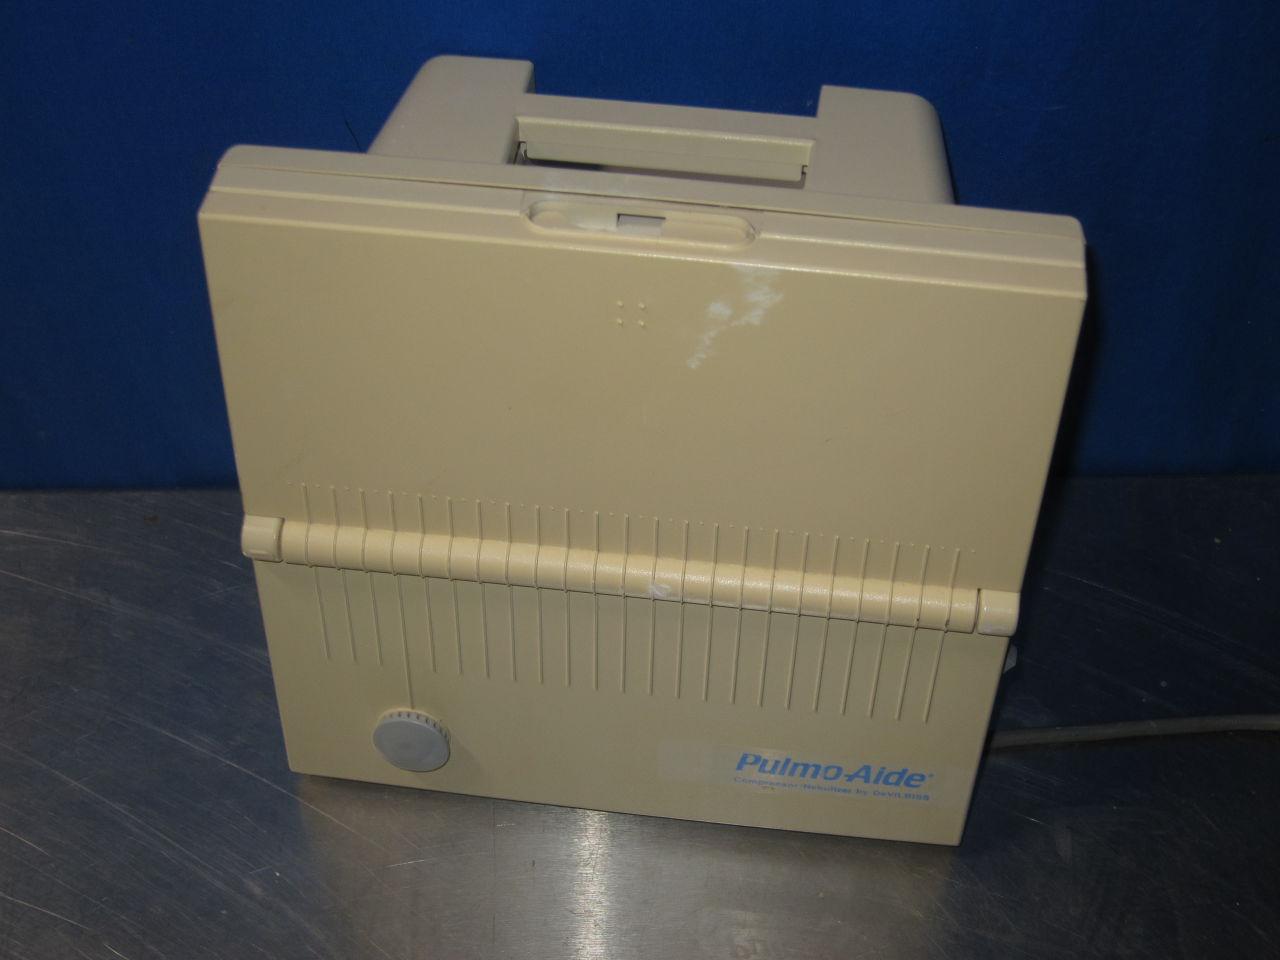 DEVILBISS 5650H Nebulizer